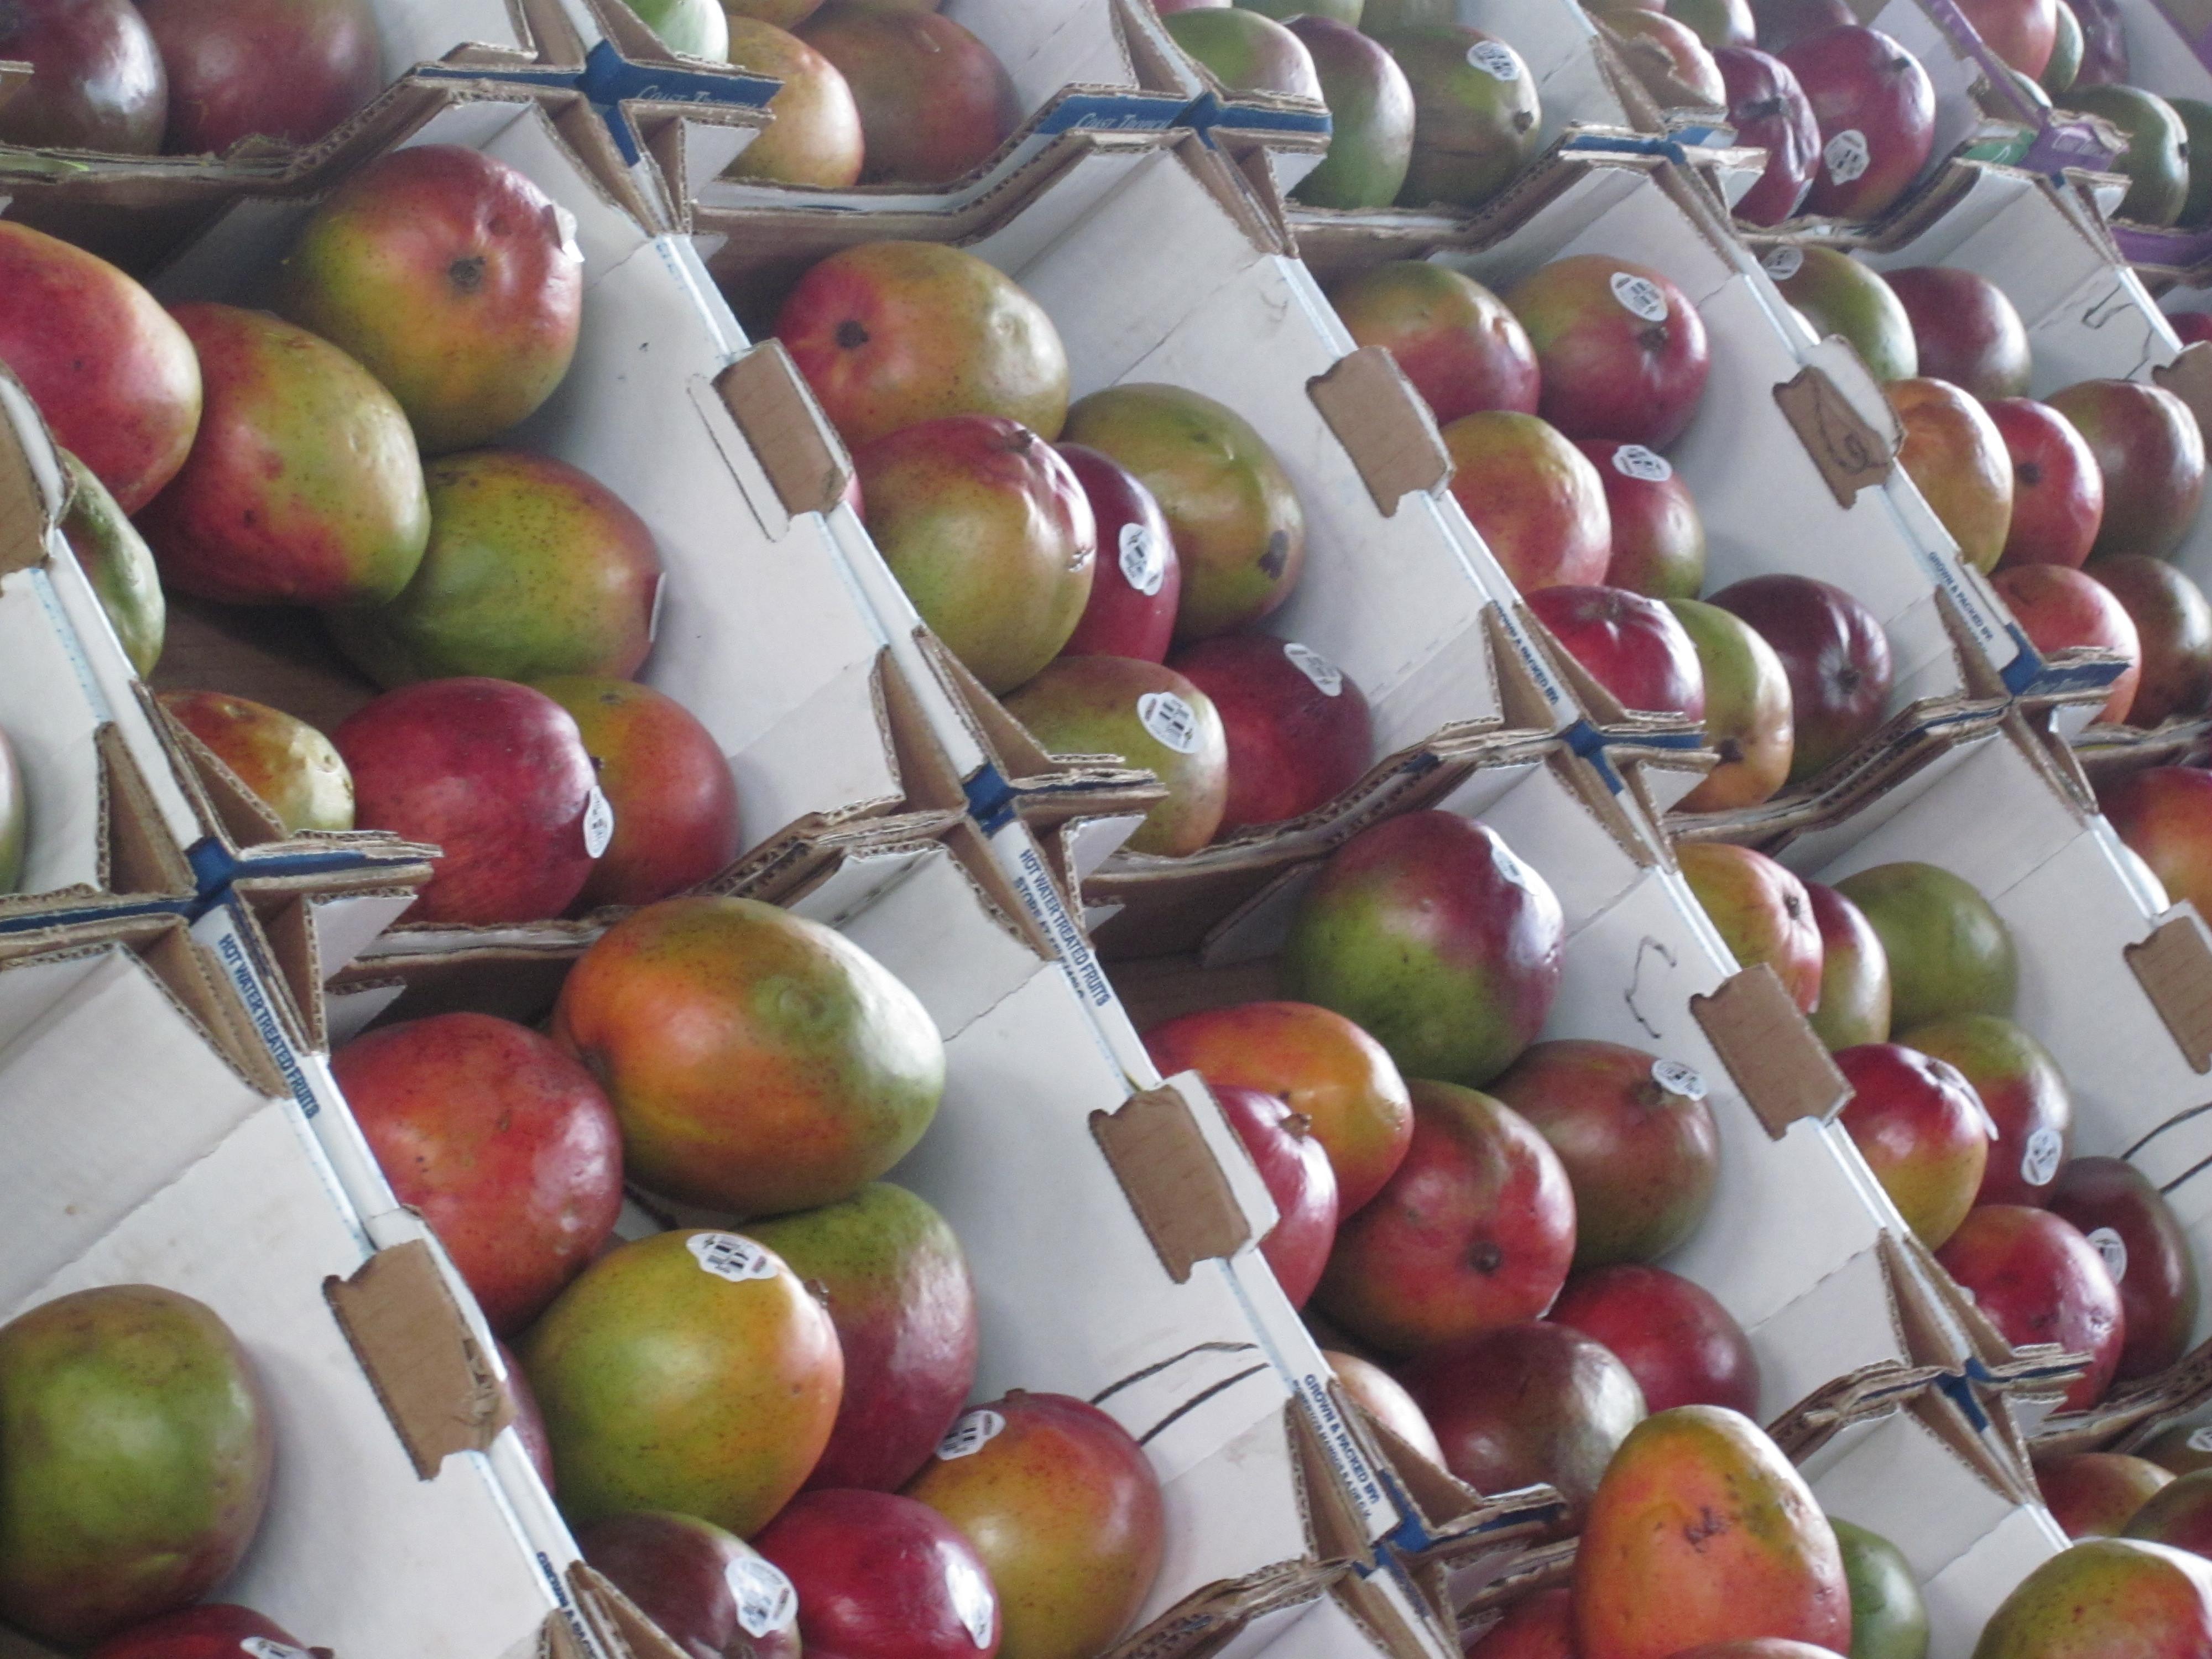 2013-07-09-mangoboxes.JPG